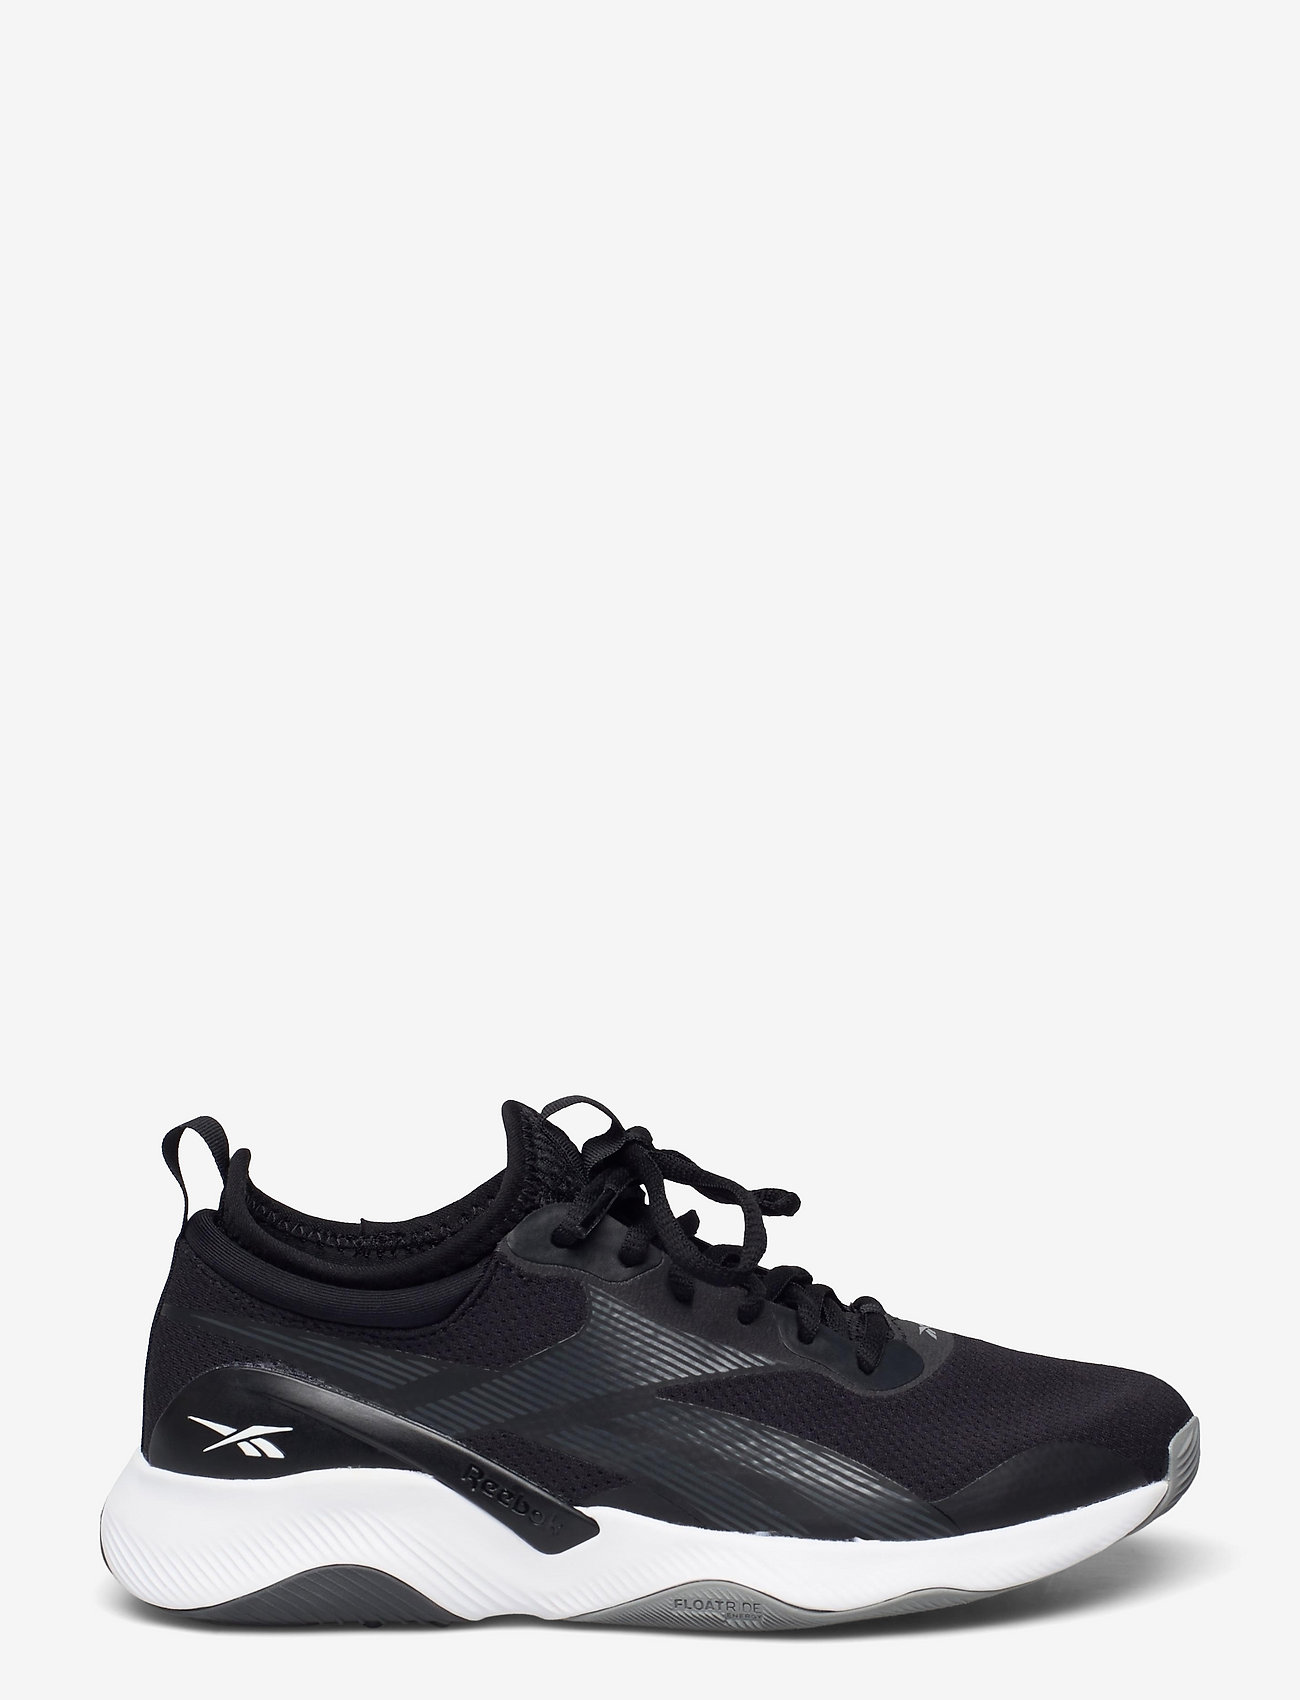 Reebok Performance - REEBOK HIIT TR 2.0 - training schoenen - black/ftwwht/pugry5 - 1